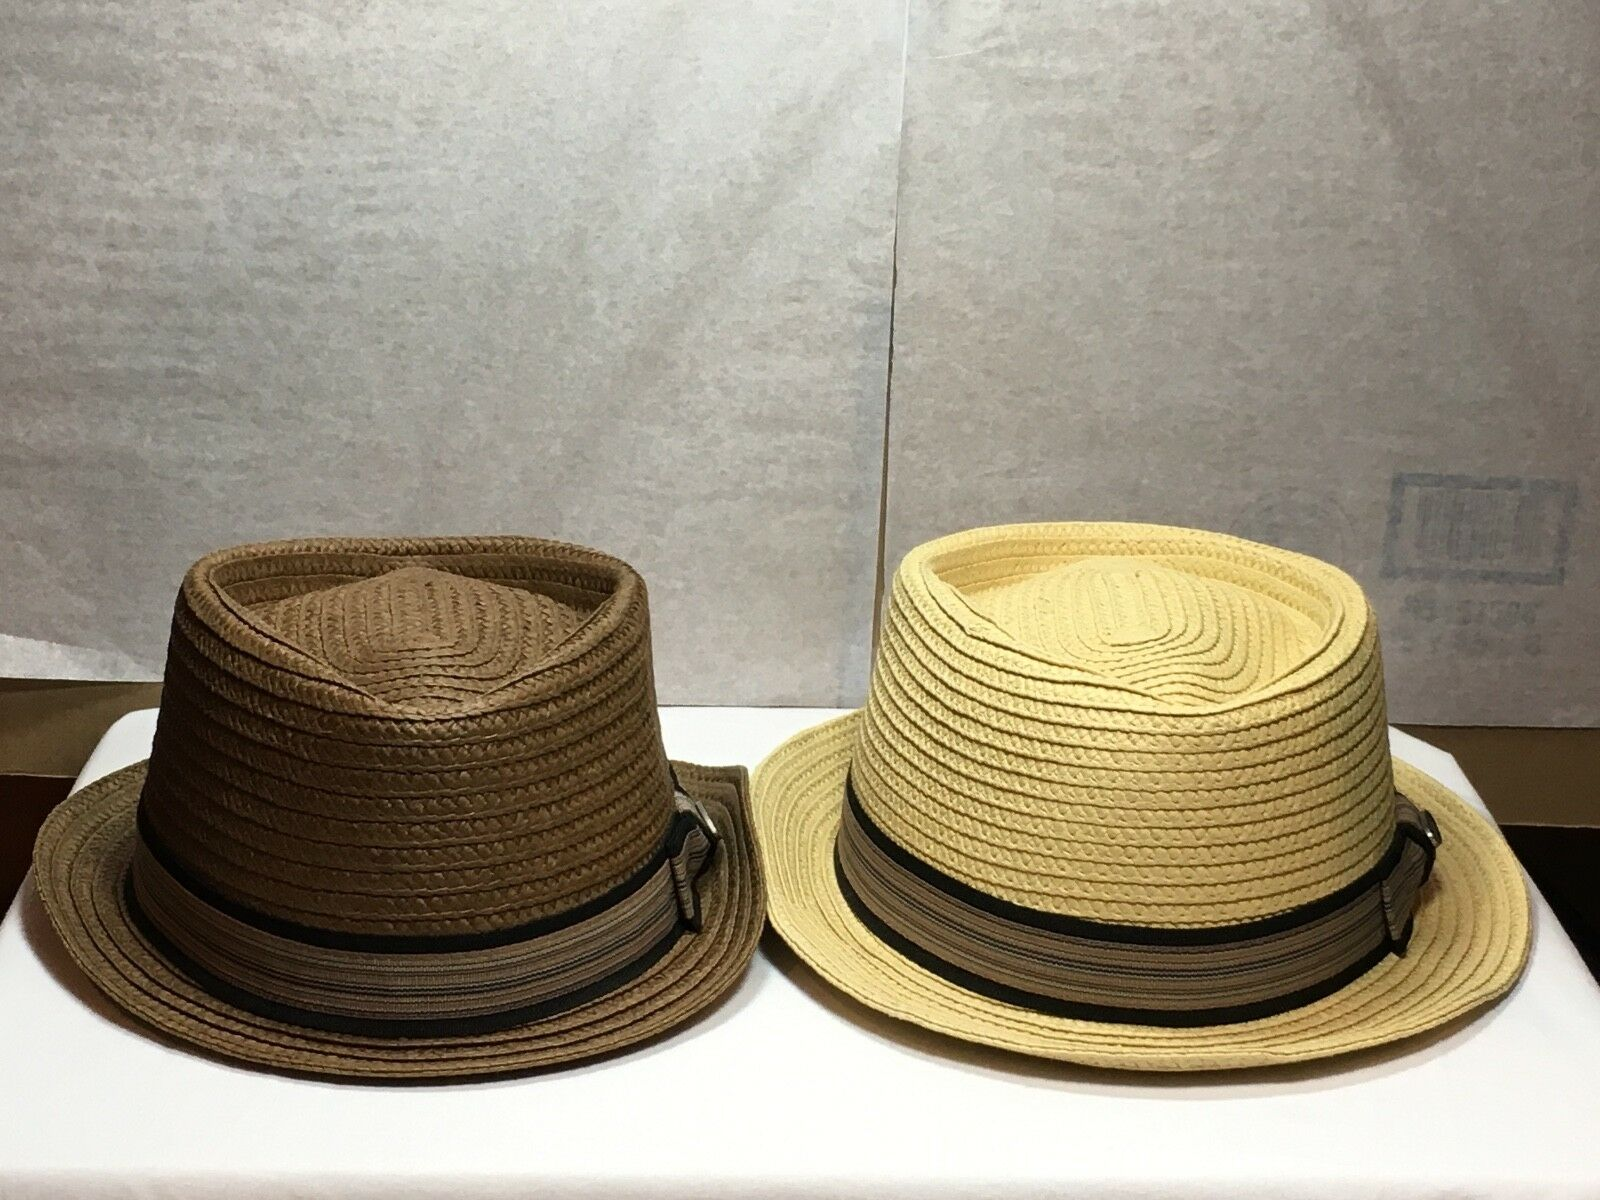 New Dorfman with Tag Dorfman New Pacific Men's Summer Hat 2e4406